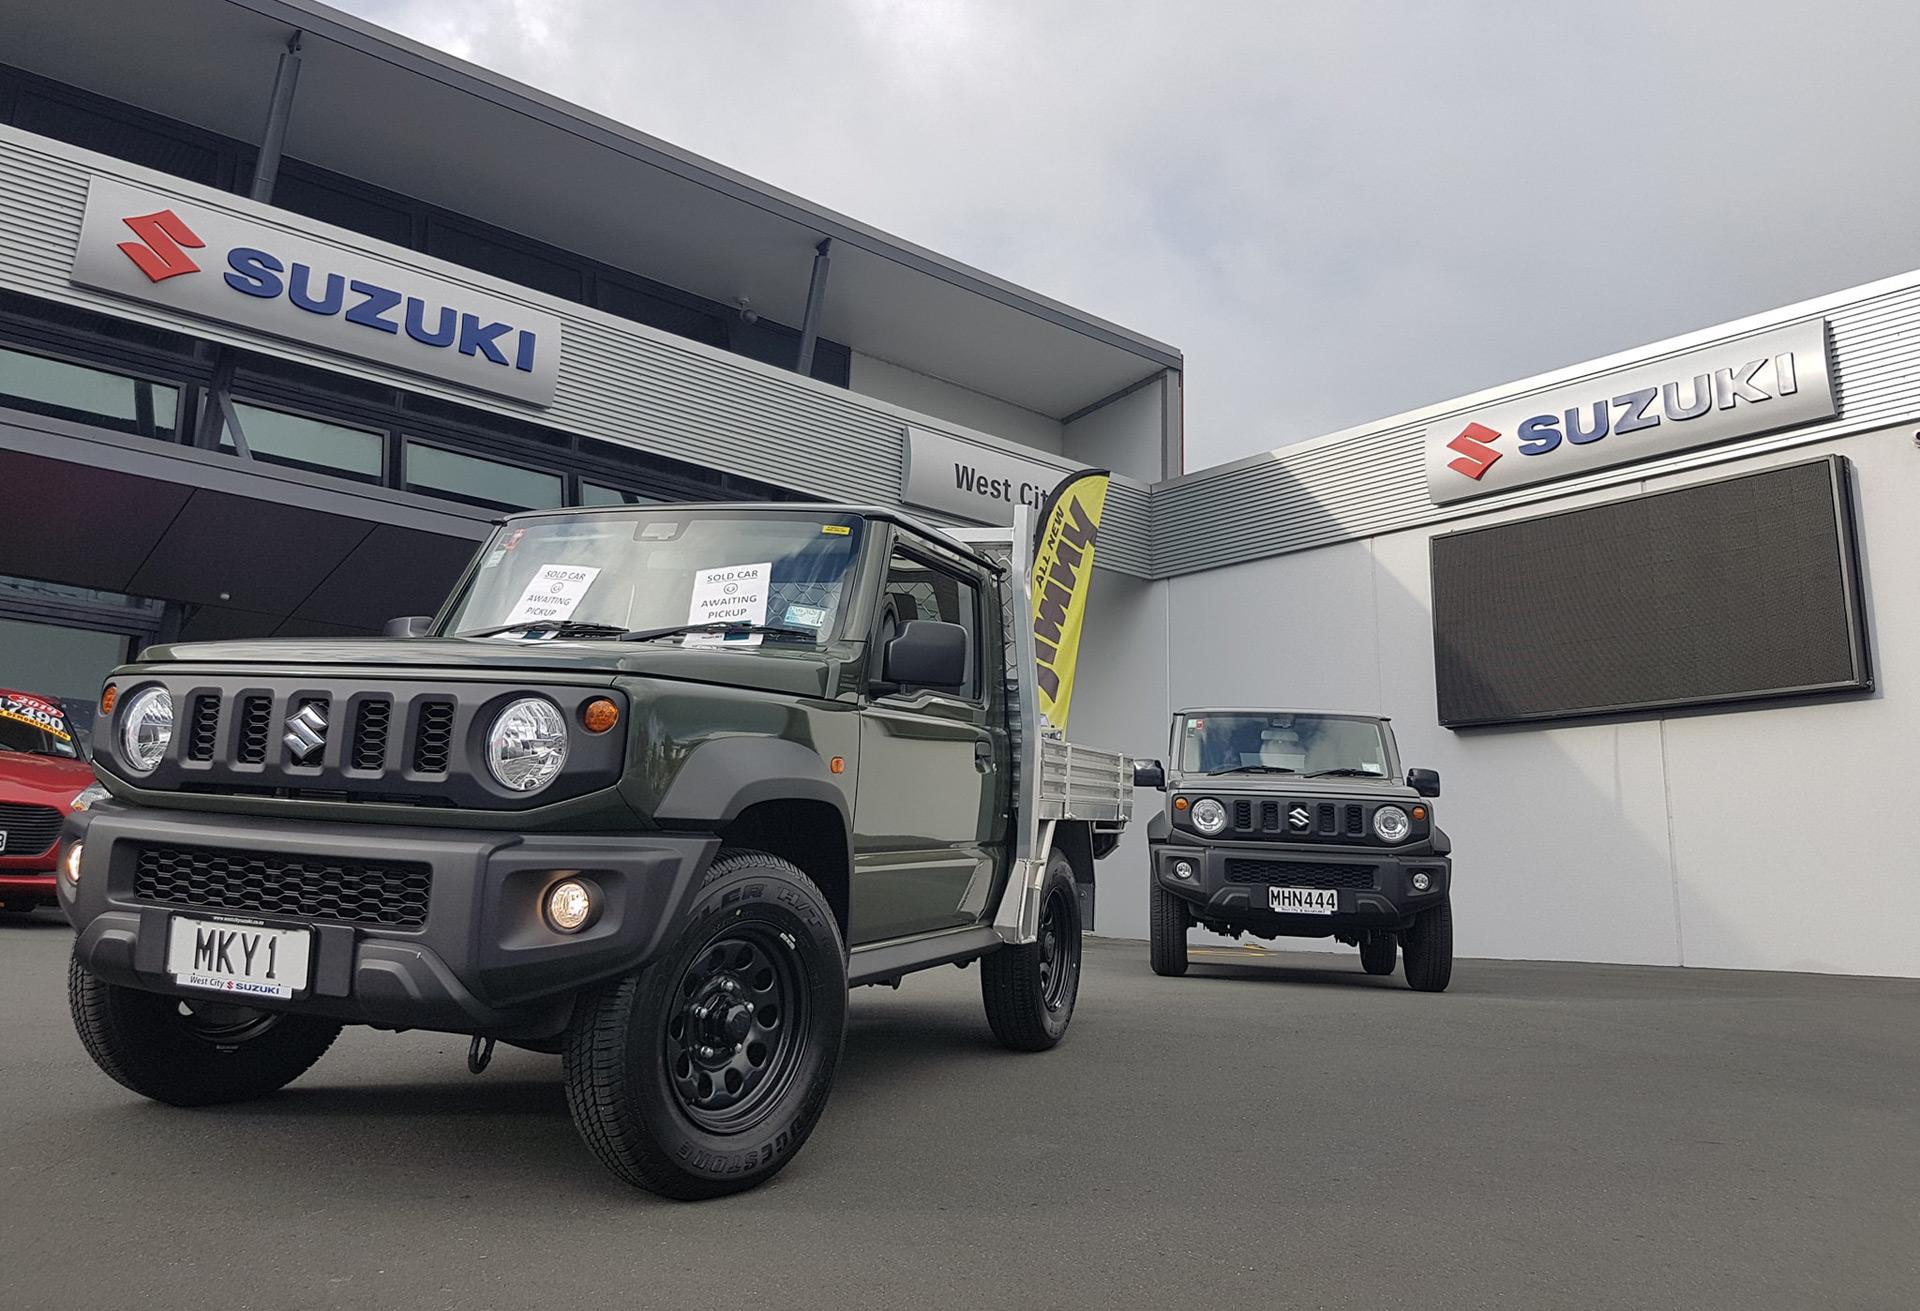 2019-suzuki-jimny-flatdeck-pickup-truck-conversion--photo-credit-west-city-suzuki-facebook_100740237_h